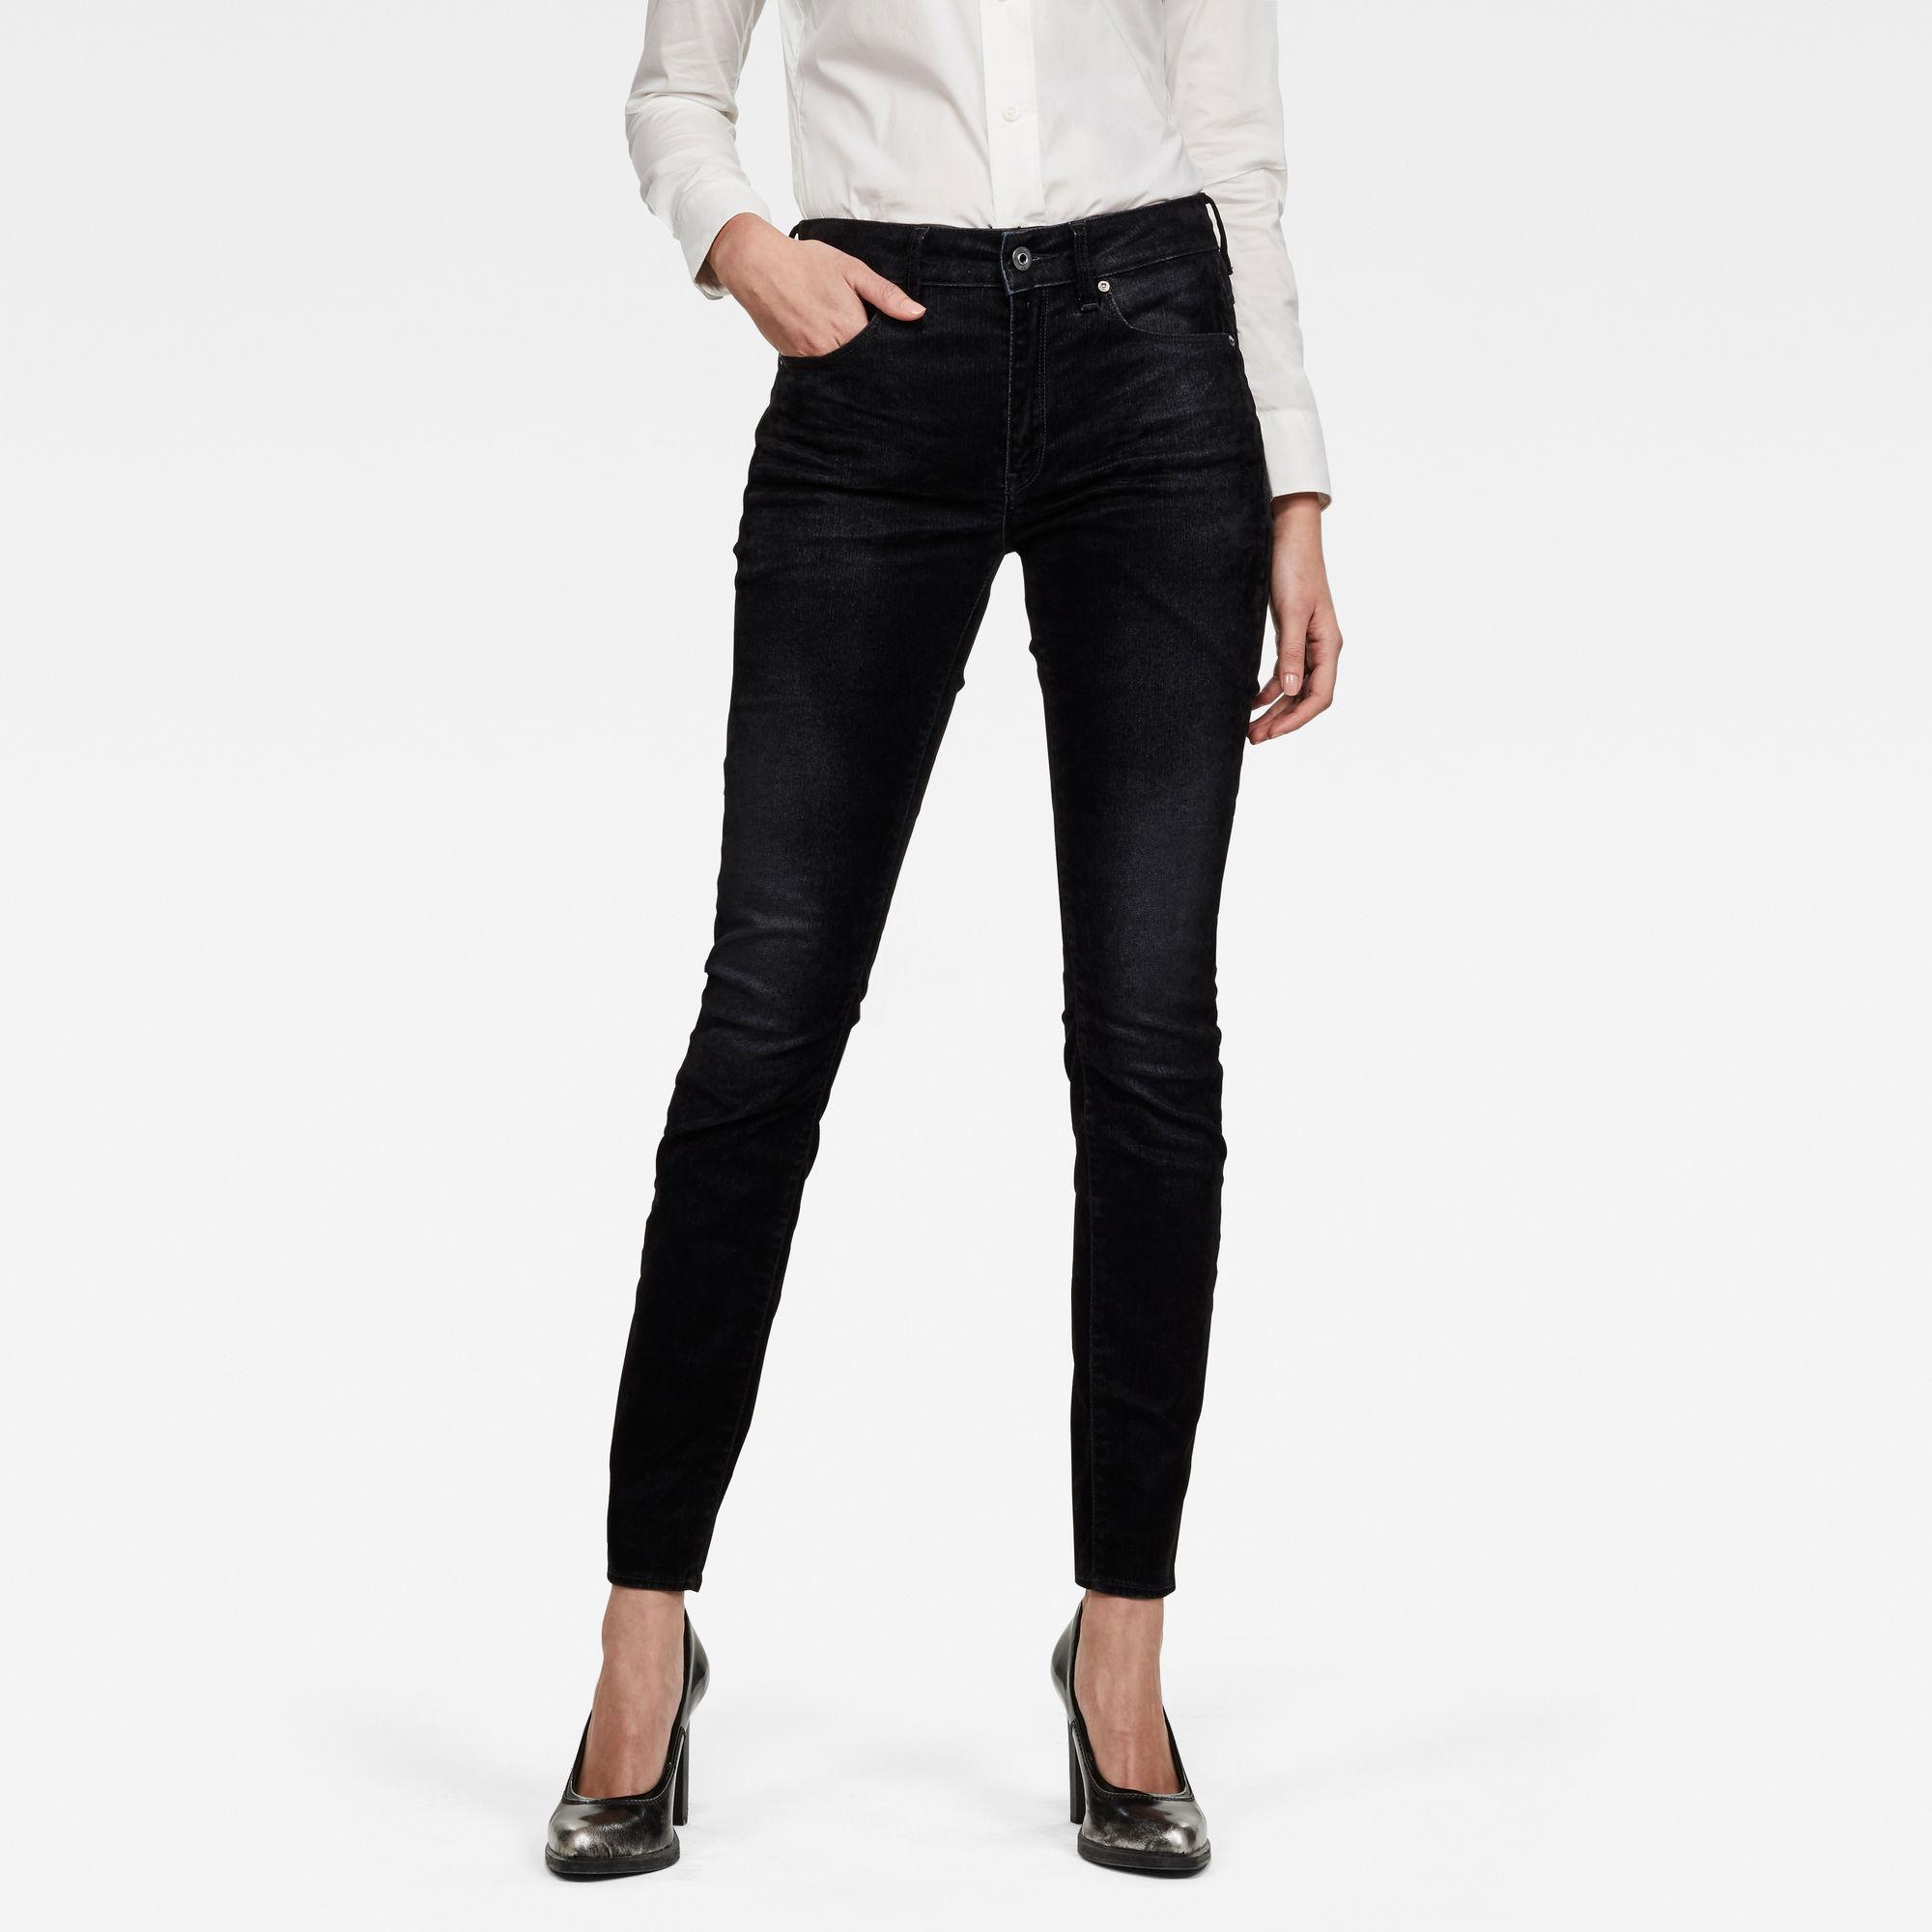 G-Star RAW Dames 3301 High Waist Skinny Jeans Zwart